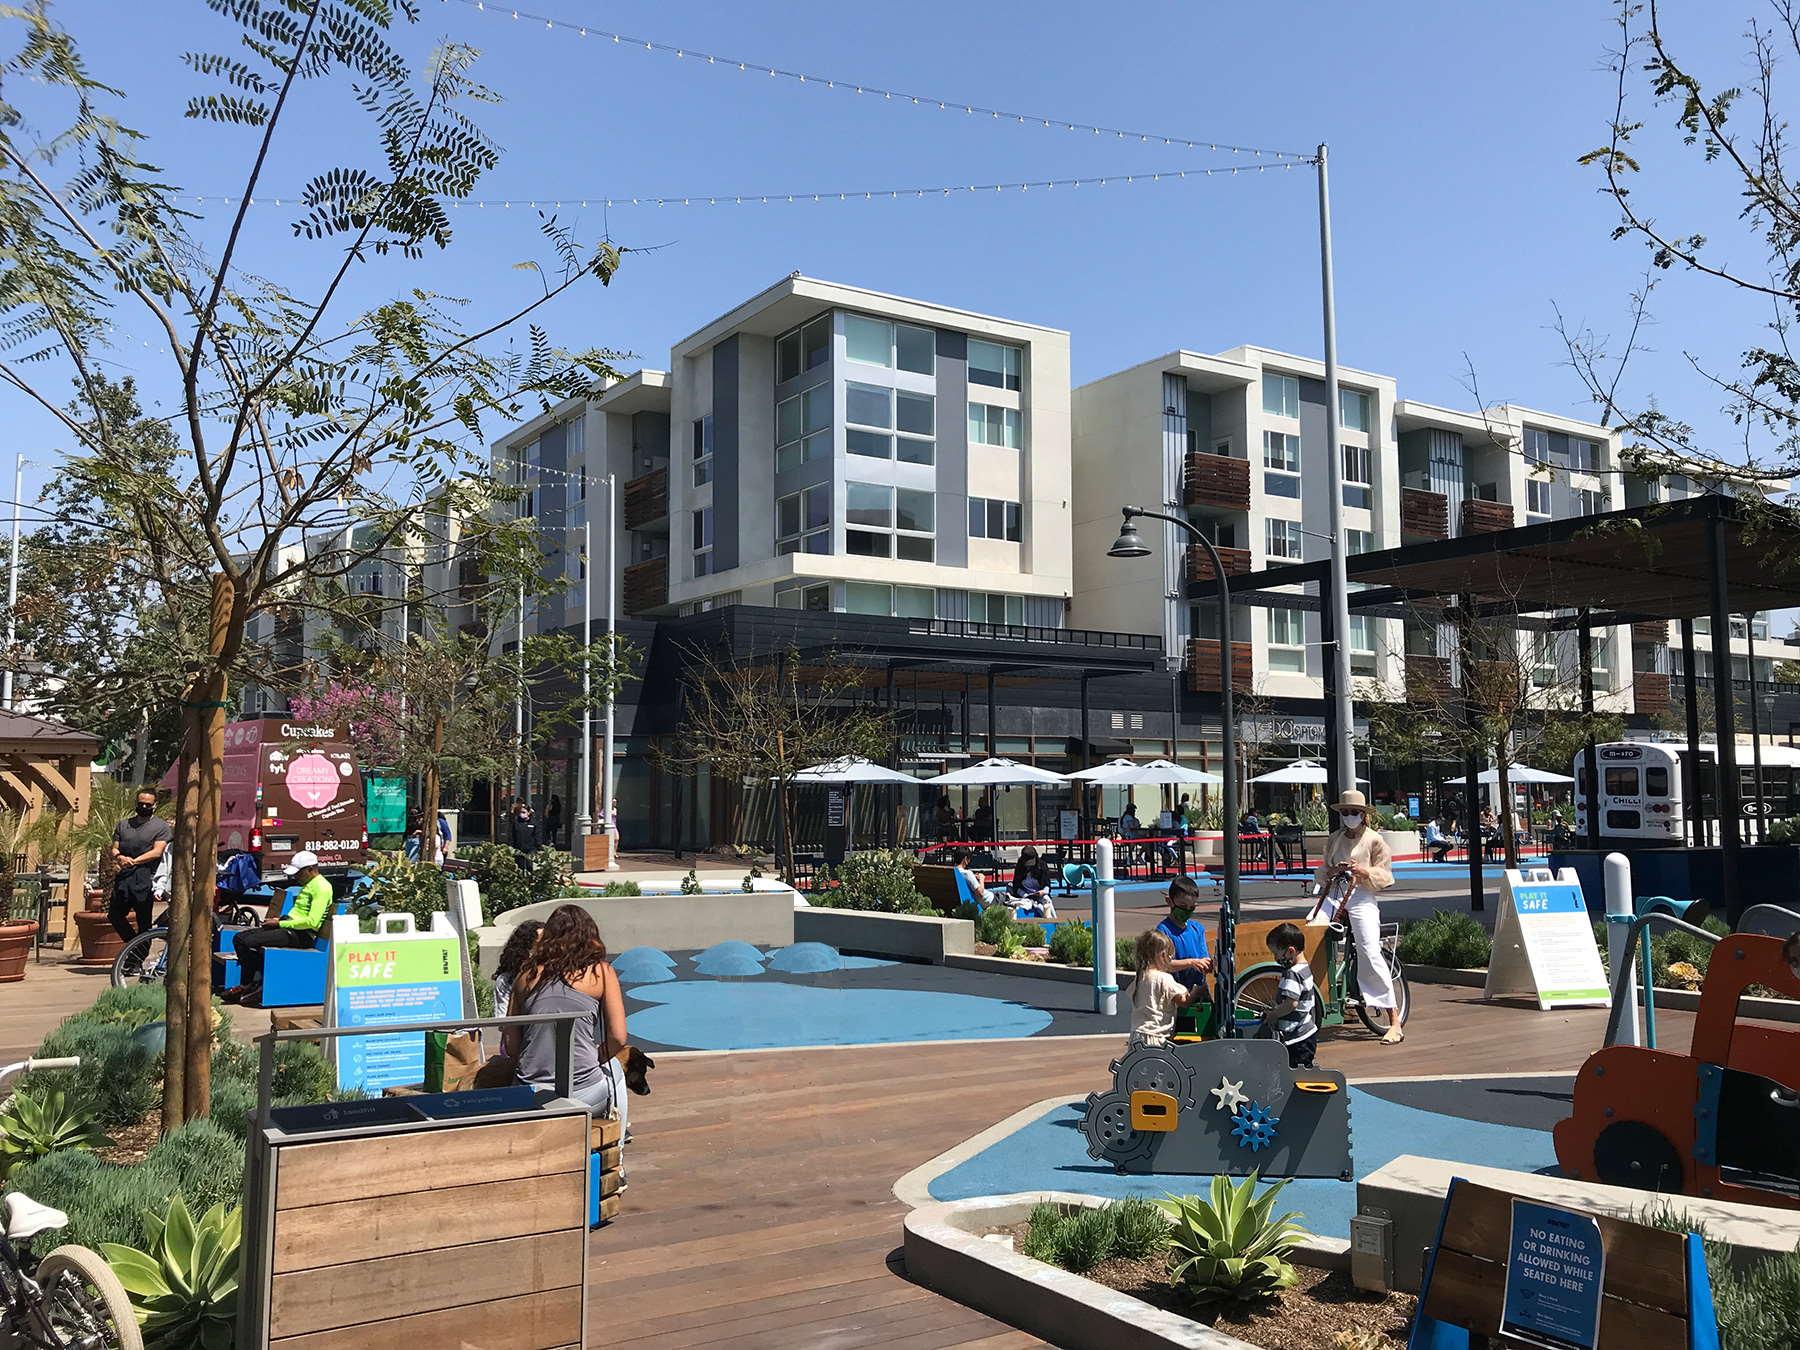 Free Market Playa Vista